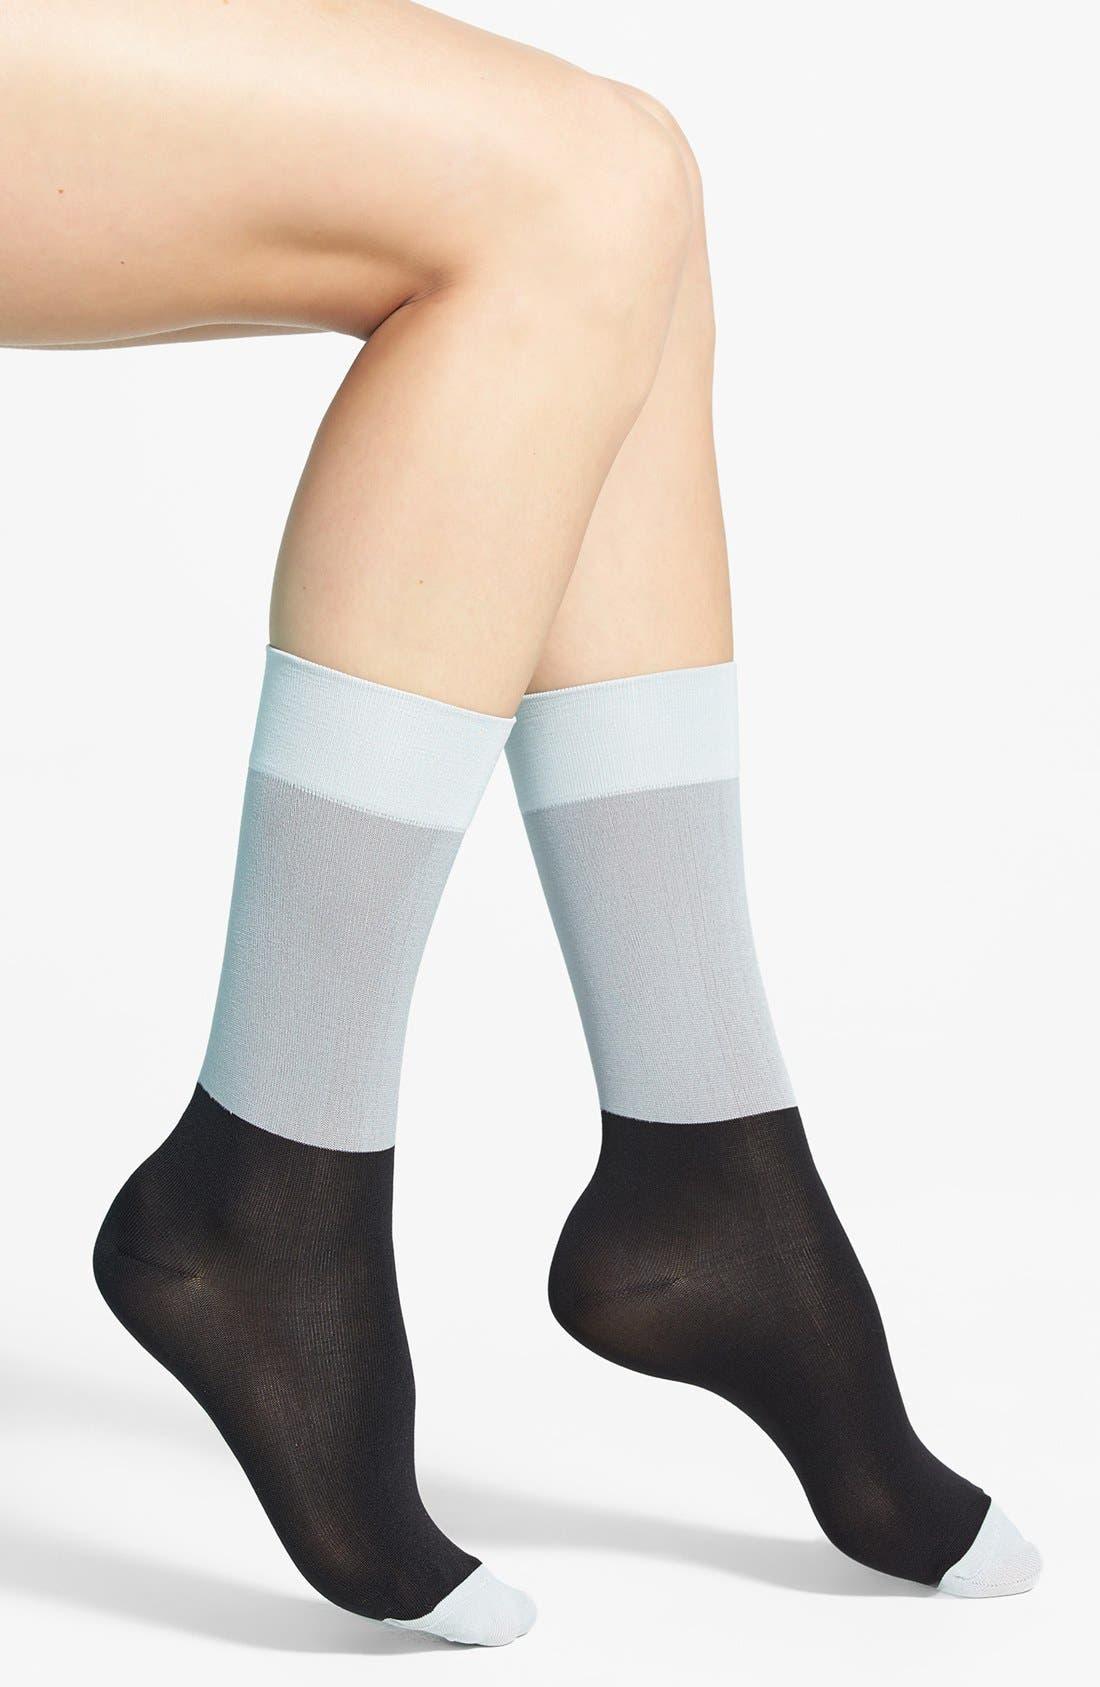 Alternate Image 1 Selected - Hue Ultrasmooth Socks (3 for $18)